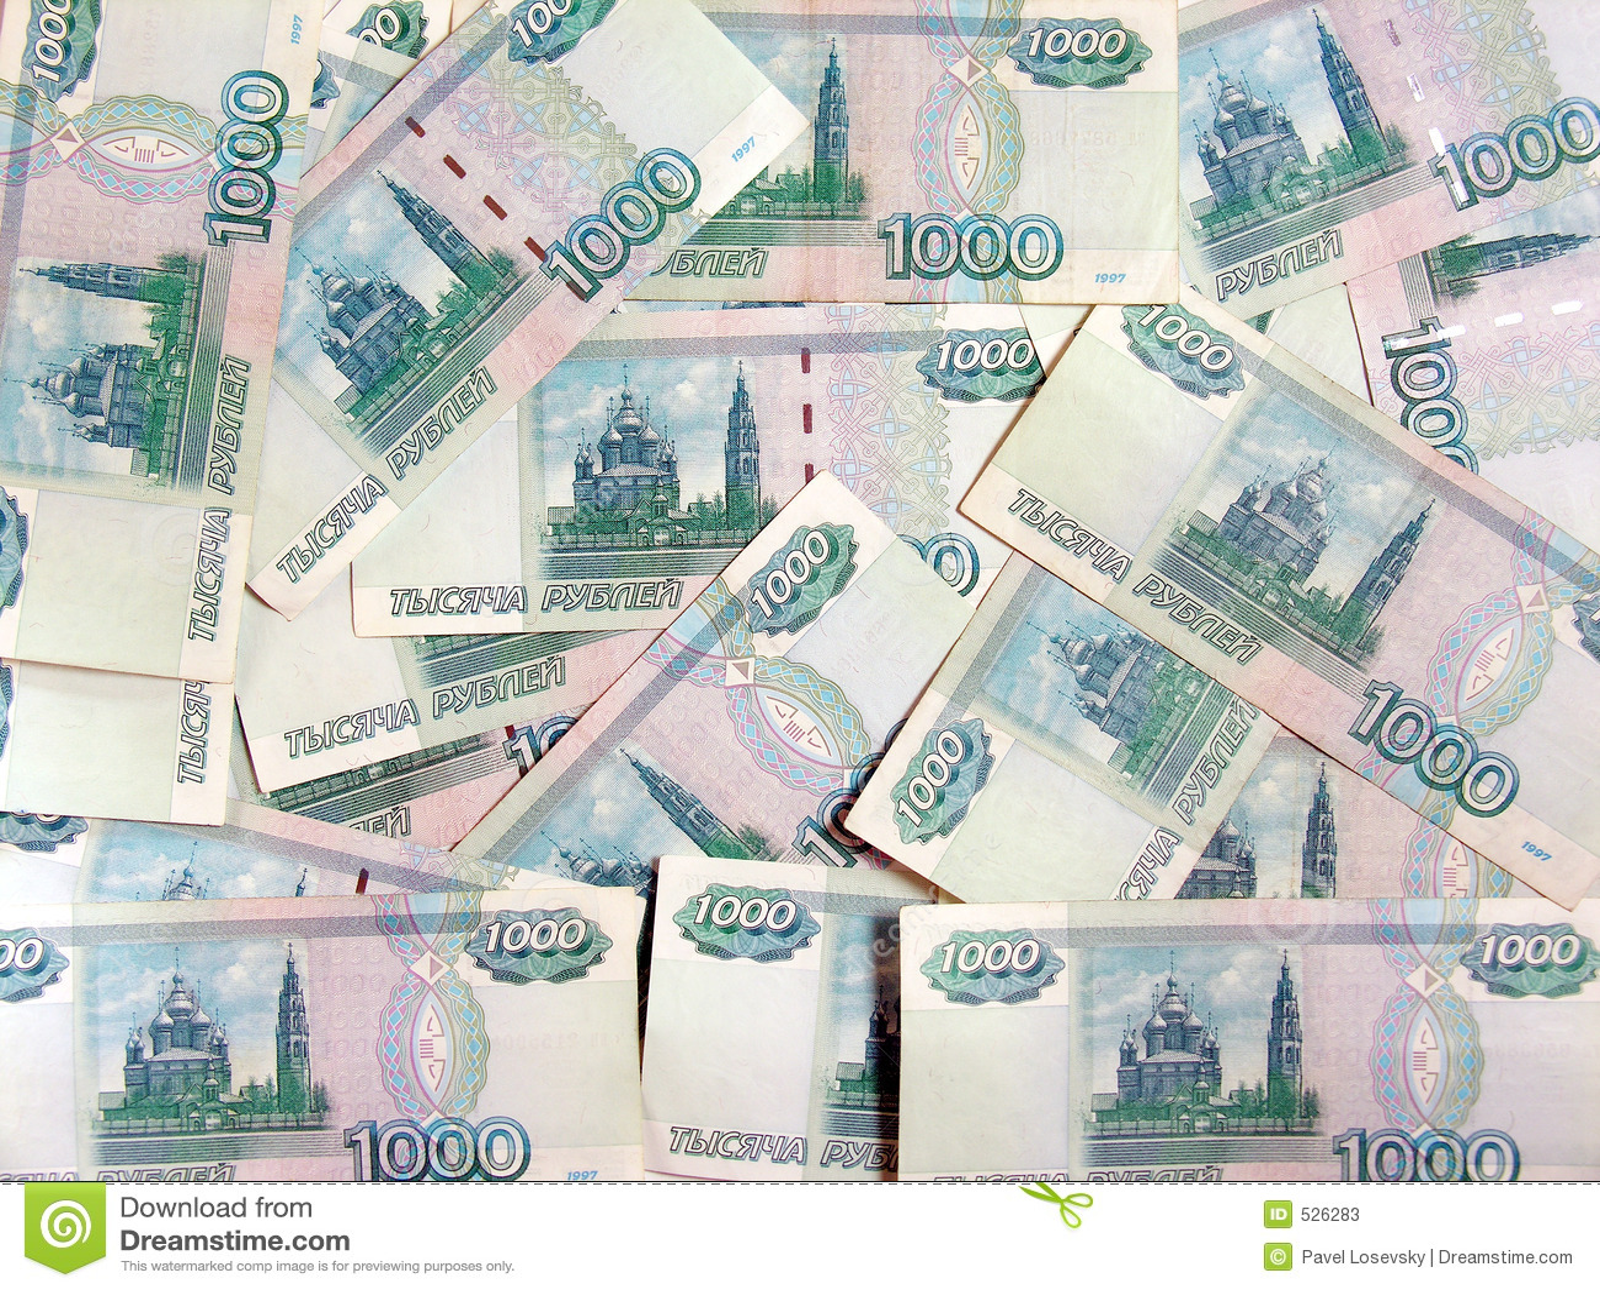 Download 卢布 库存图片. 图片 包括有 govt, 货币, 费用, 工资, 贷款, 横幅提供资金的, 市场, 许多, 评定 - 526283